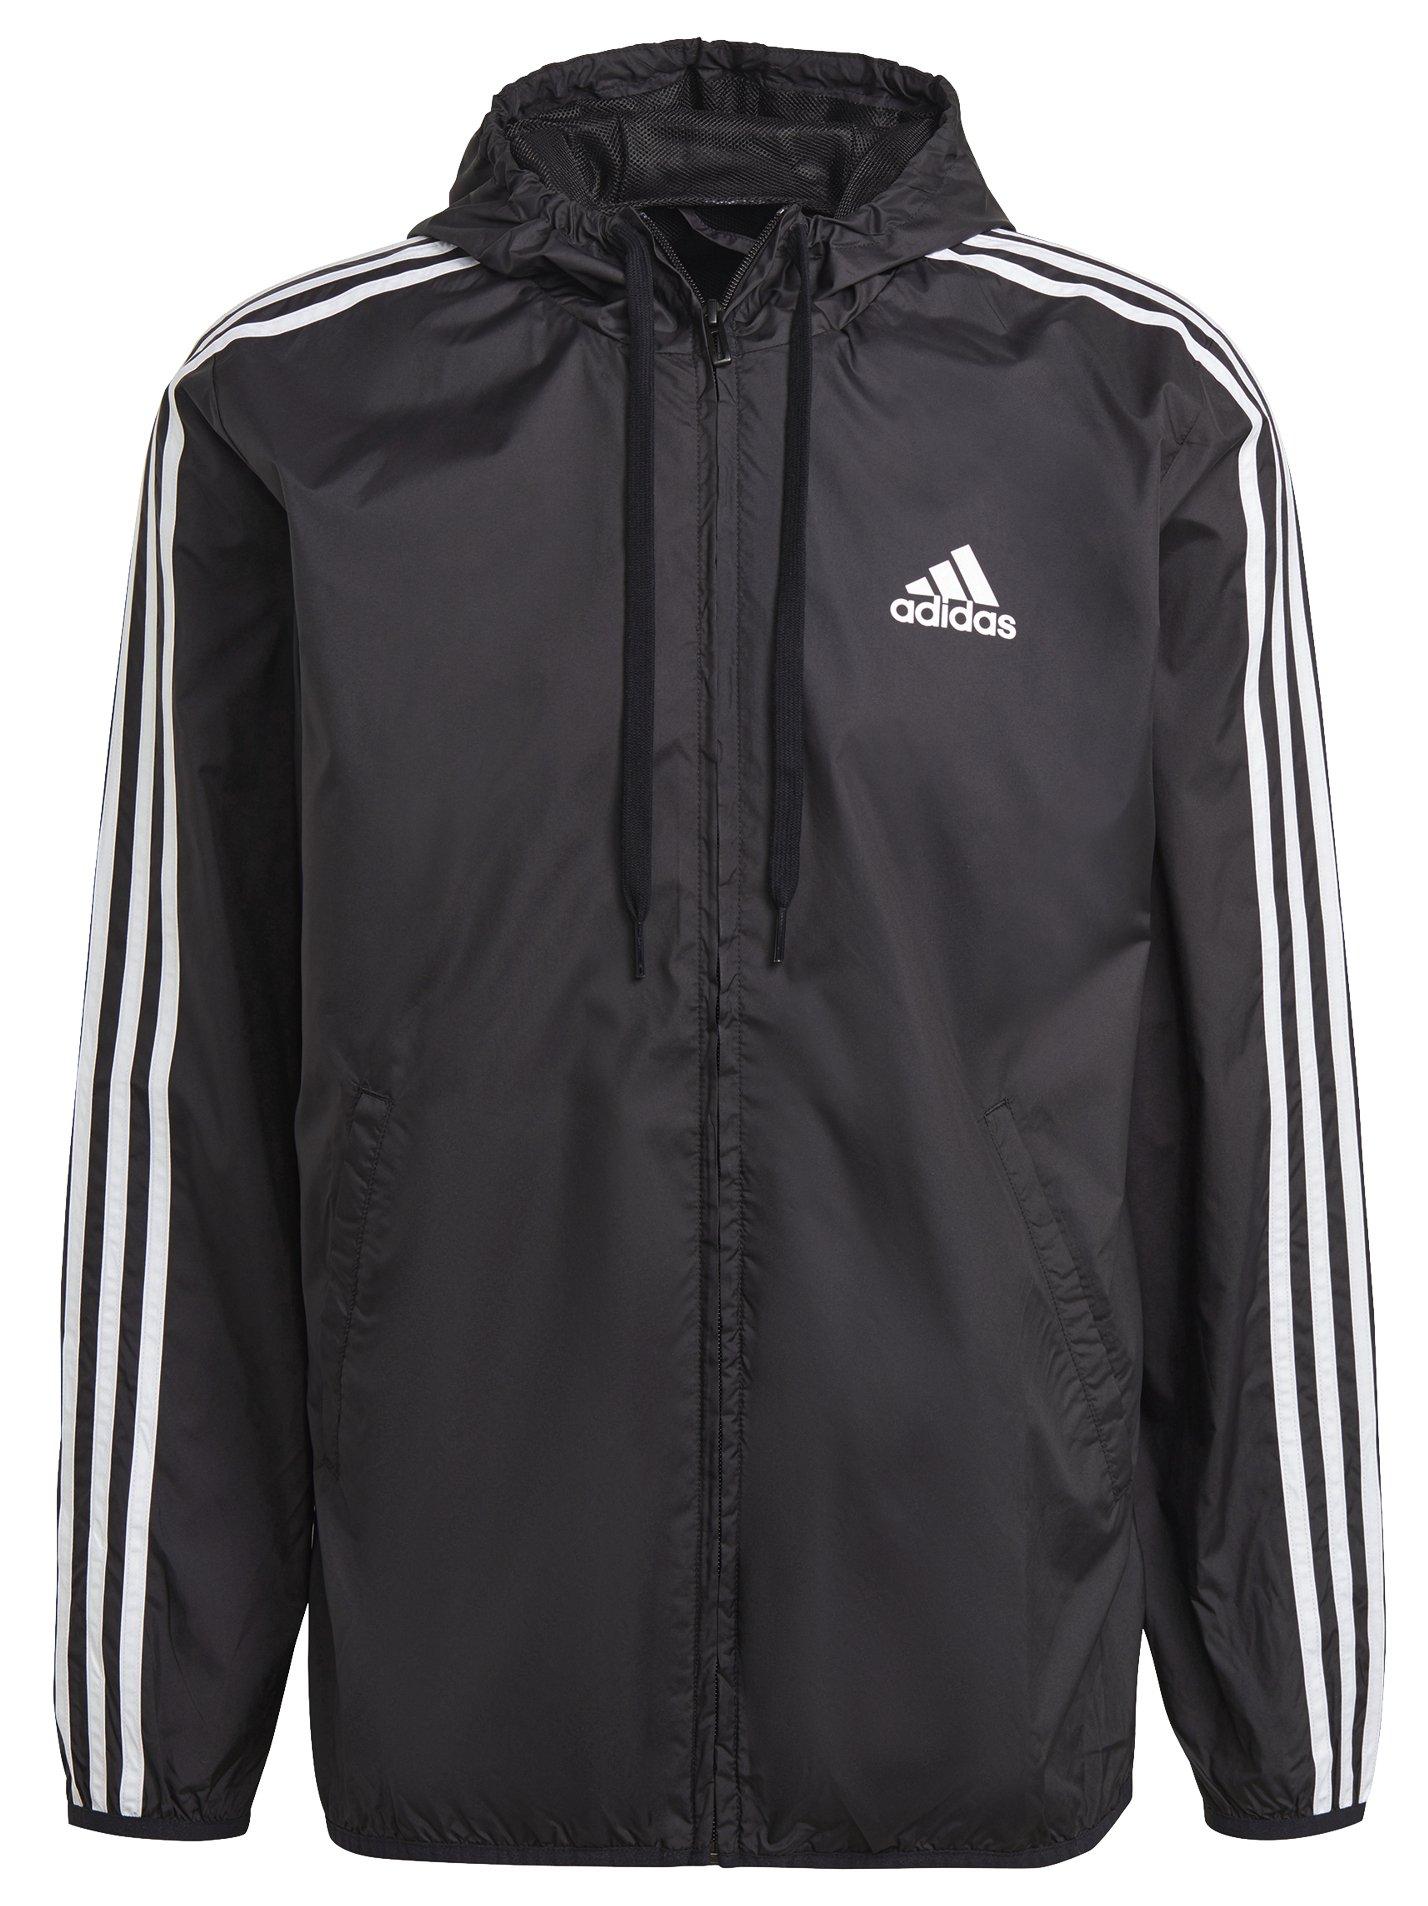 Adidas Primegreen Essentials 3-Stripes Windbreaker S